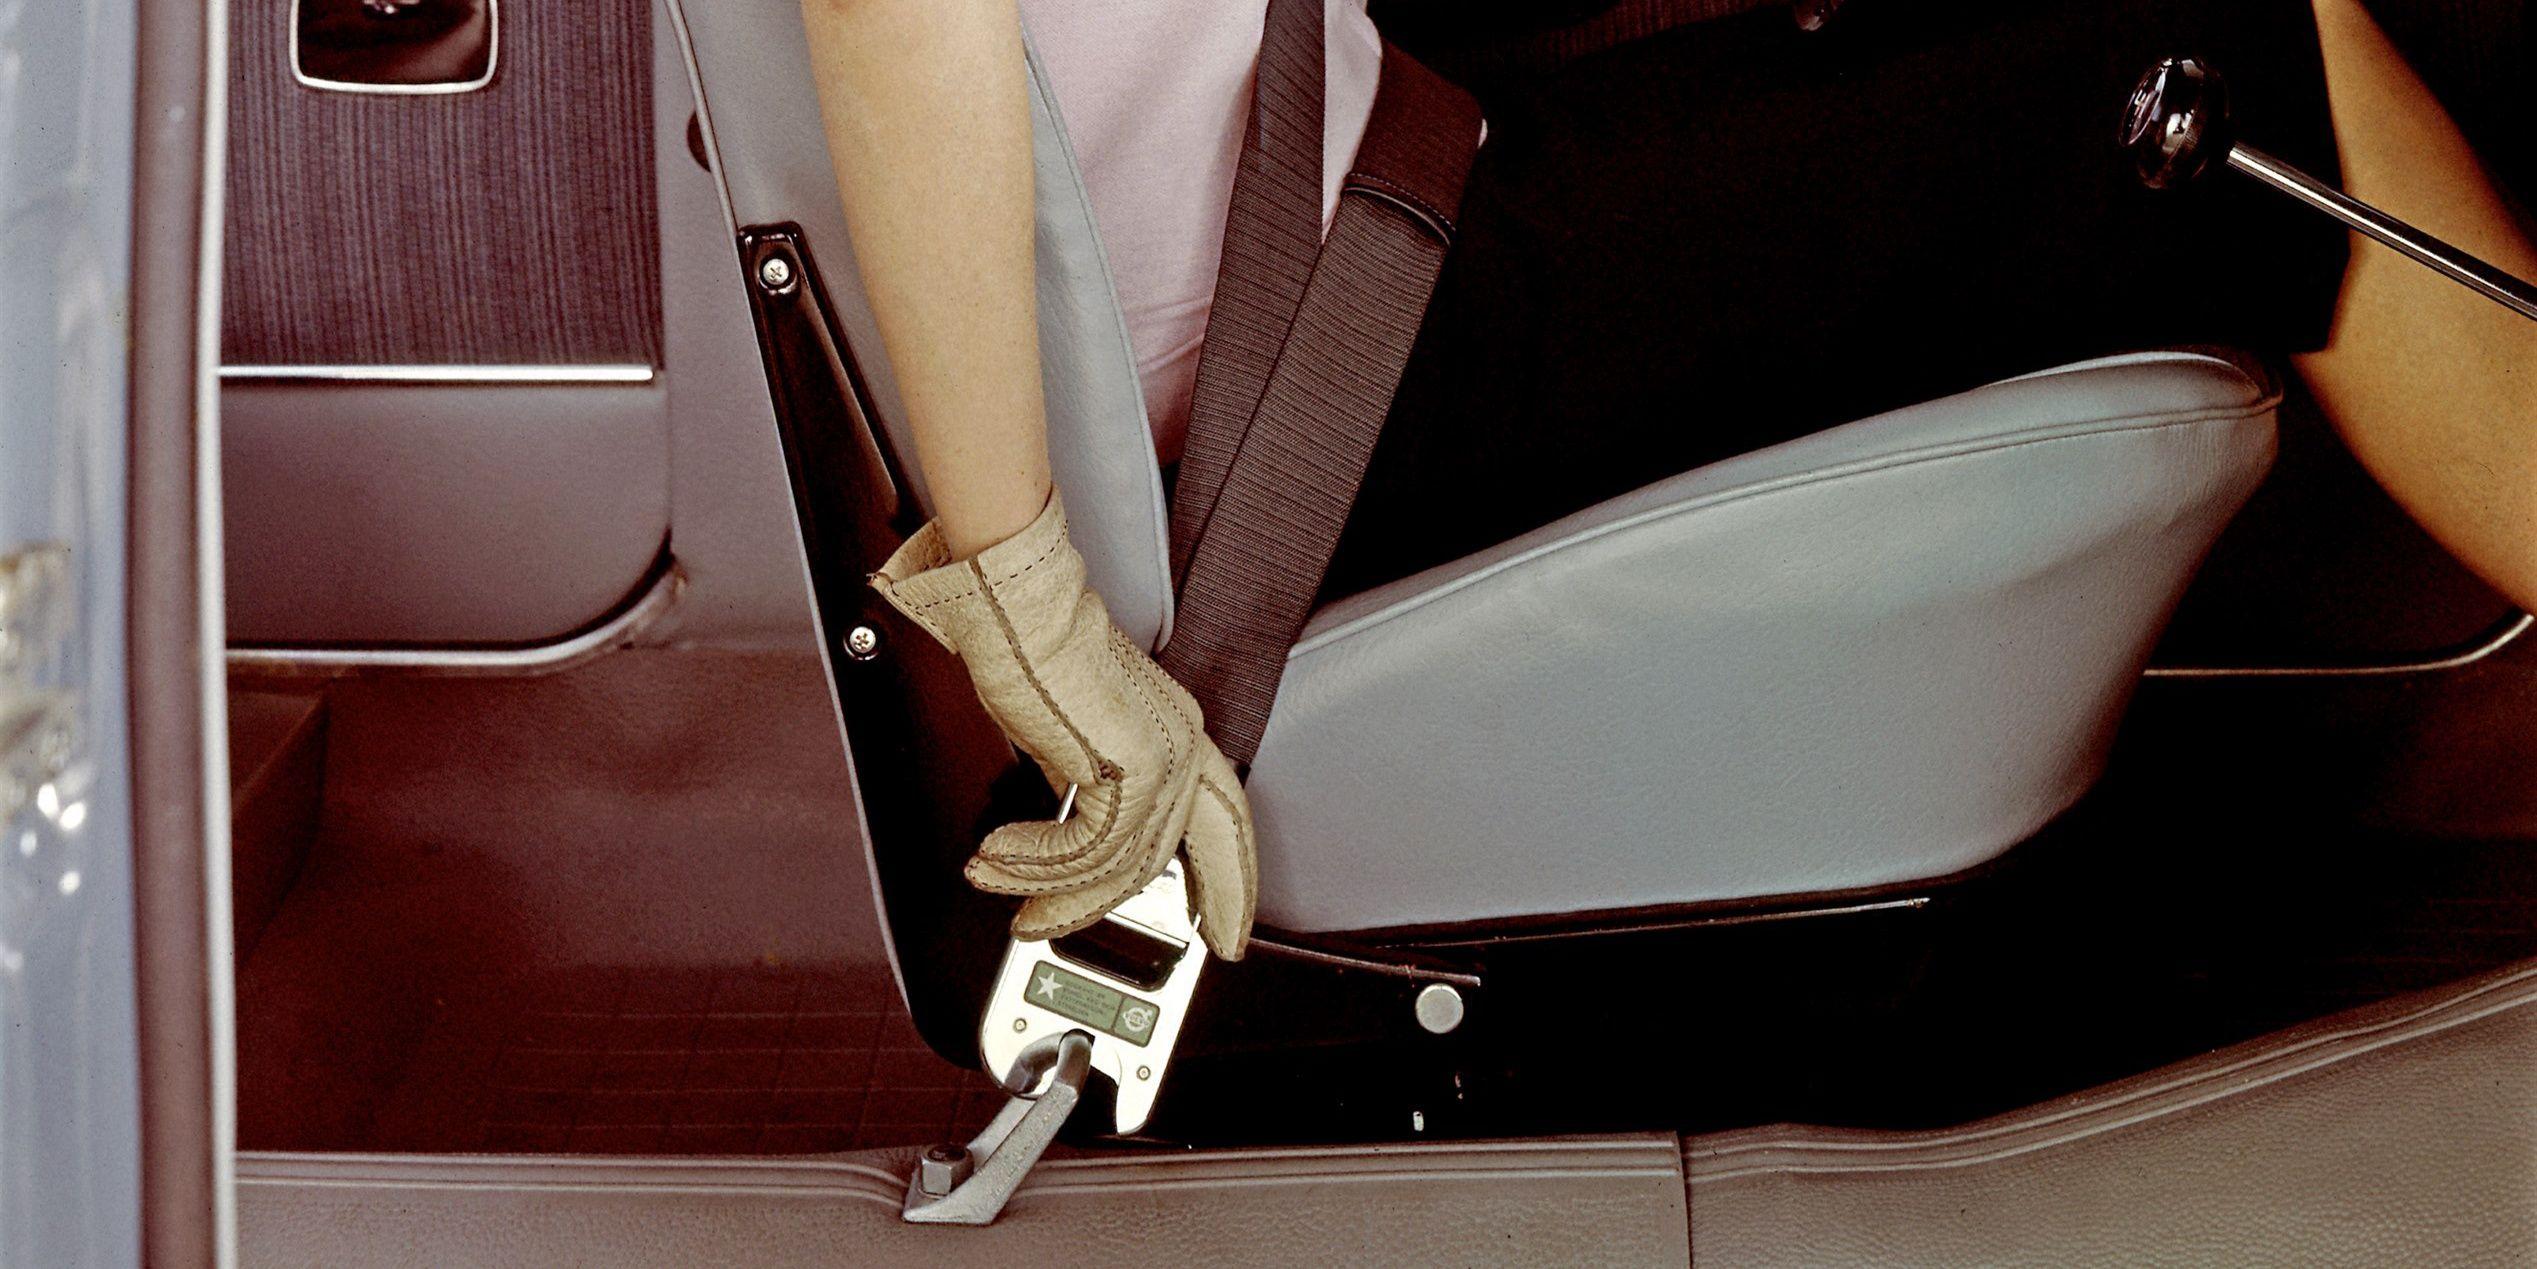 Unfastening the front seatbelt